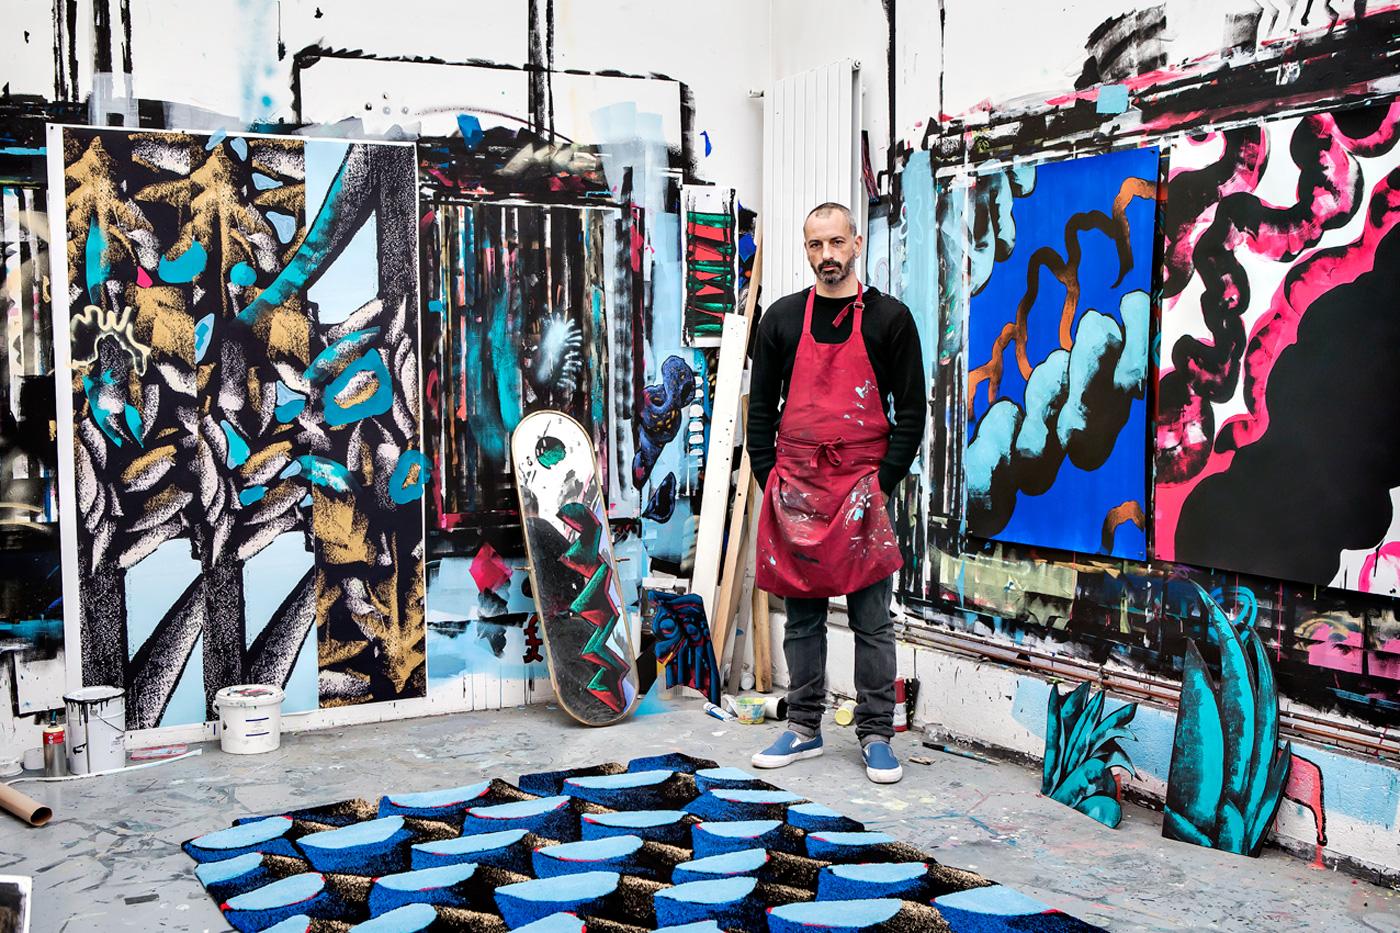 l'Artiste Julien Colombier dans son atelier